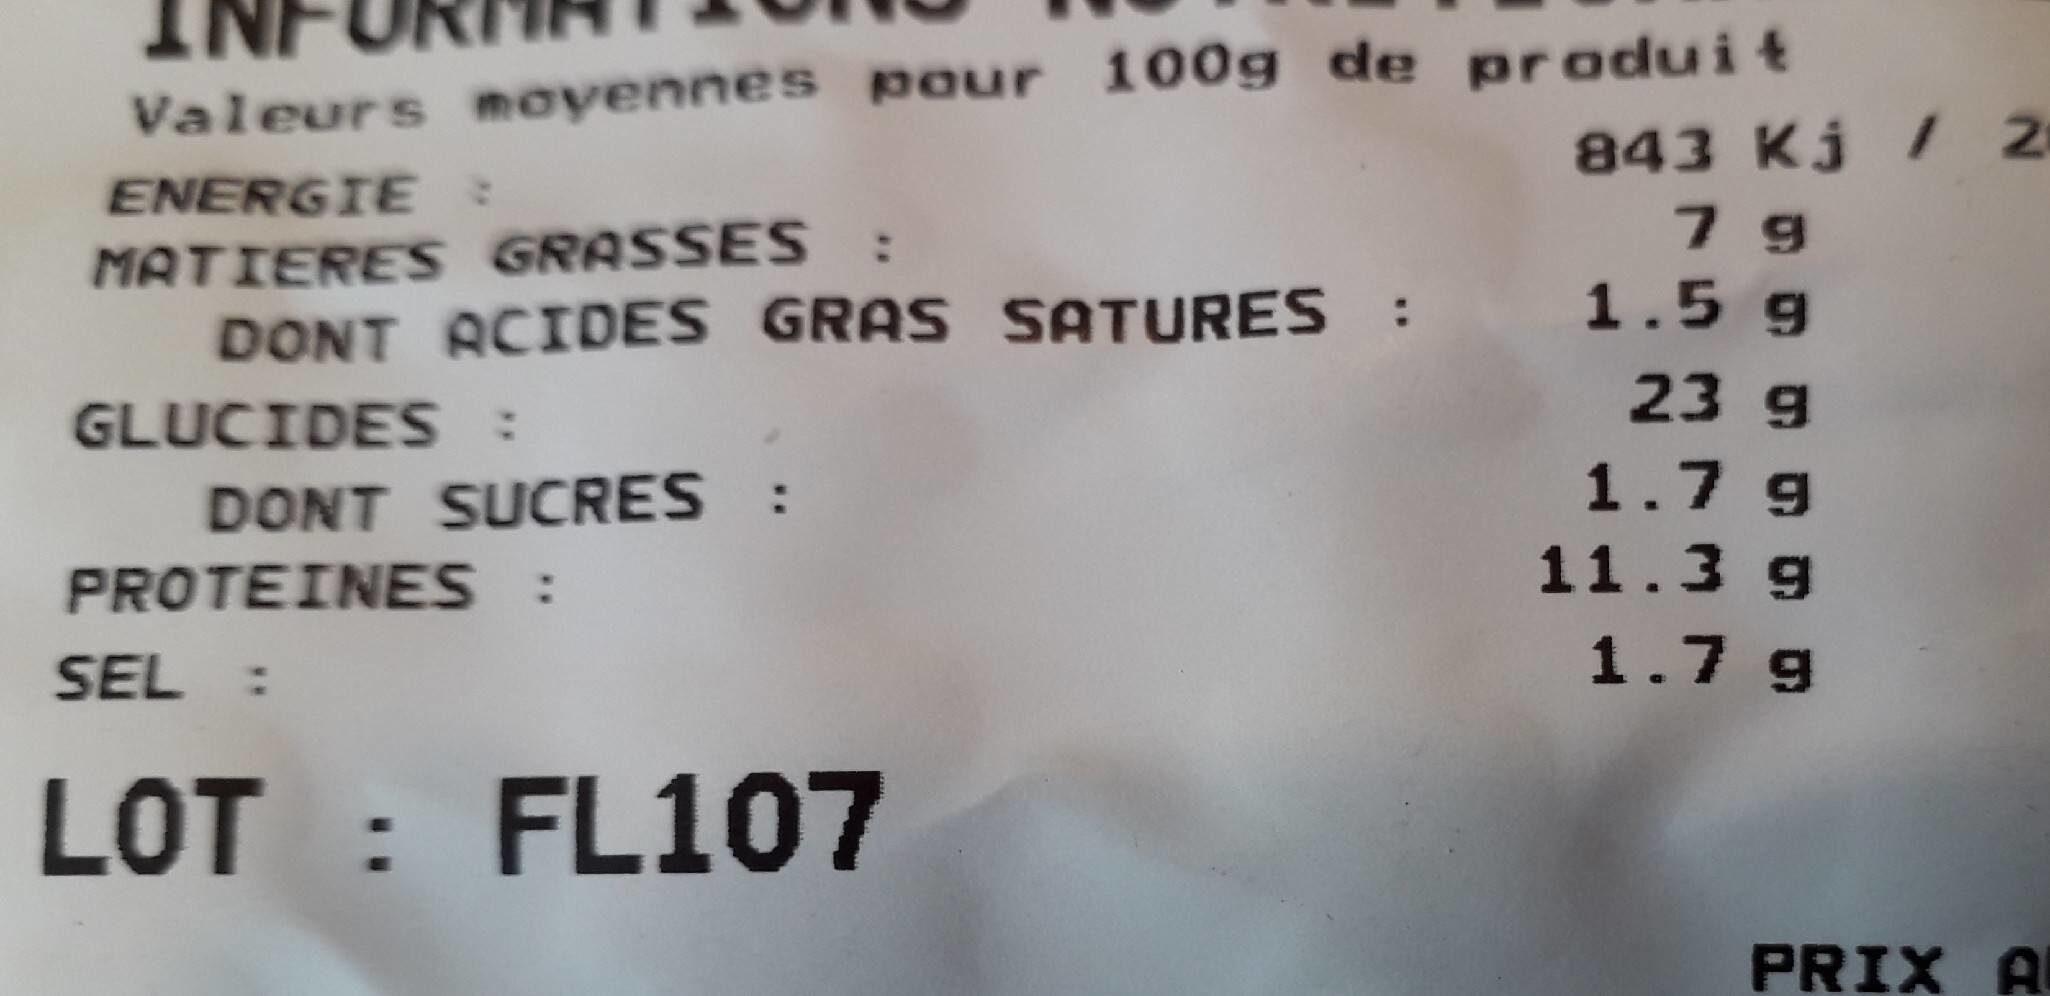 Fleischnacke sous-vide - Informations nutritionnelles - fr